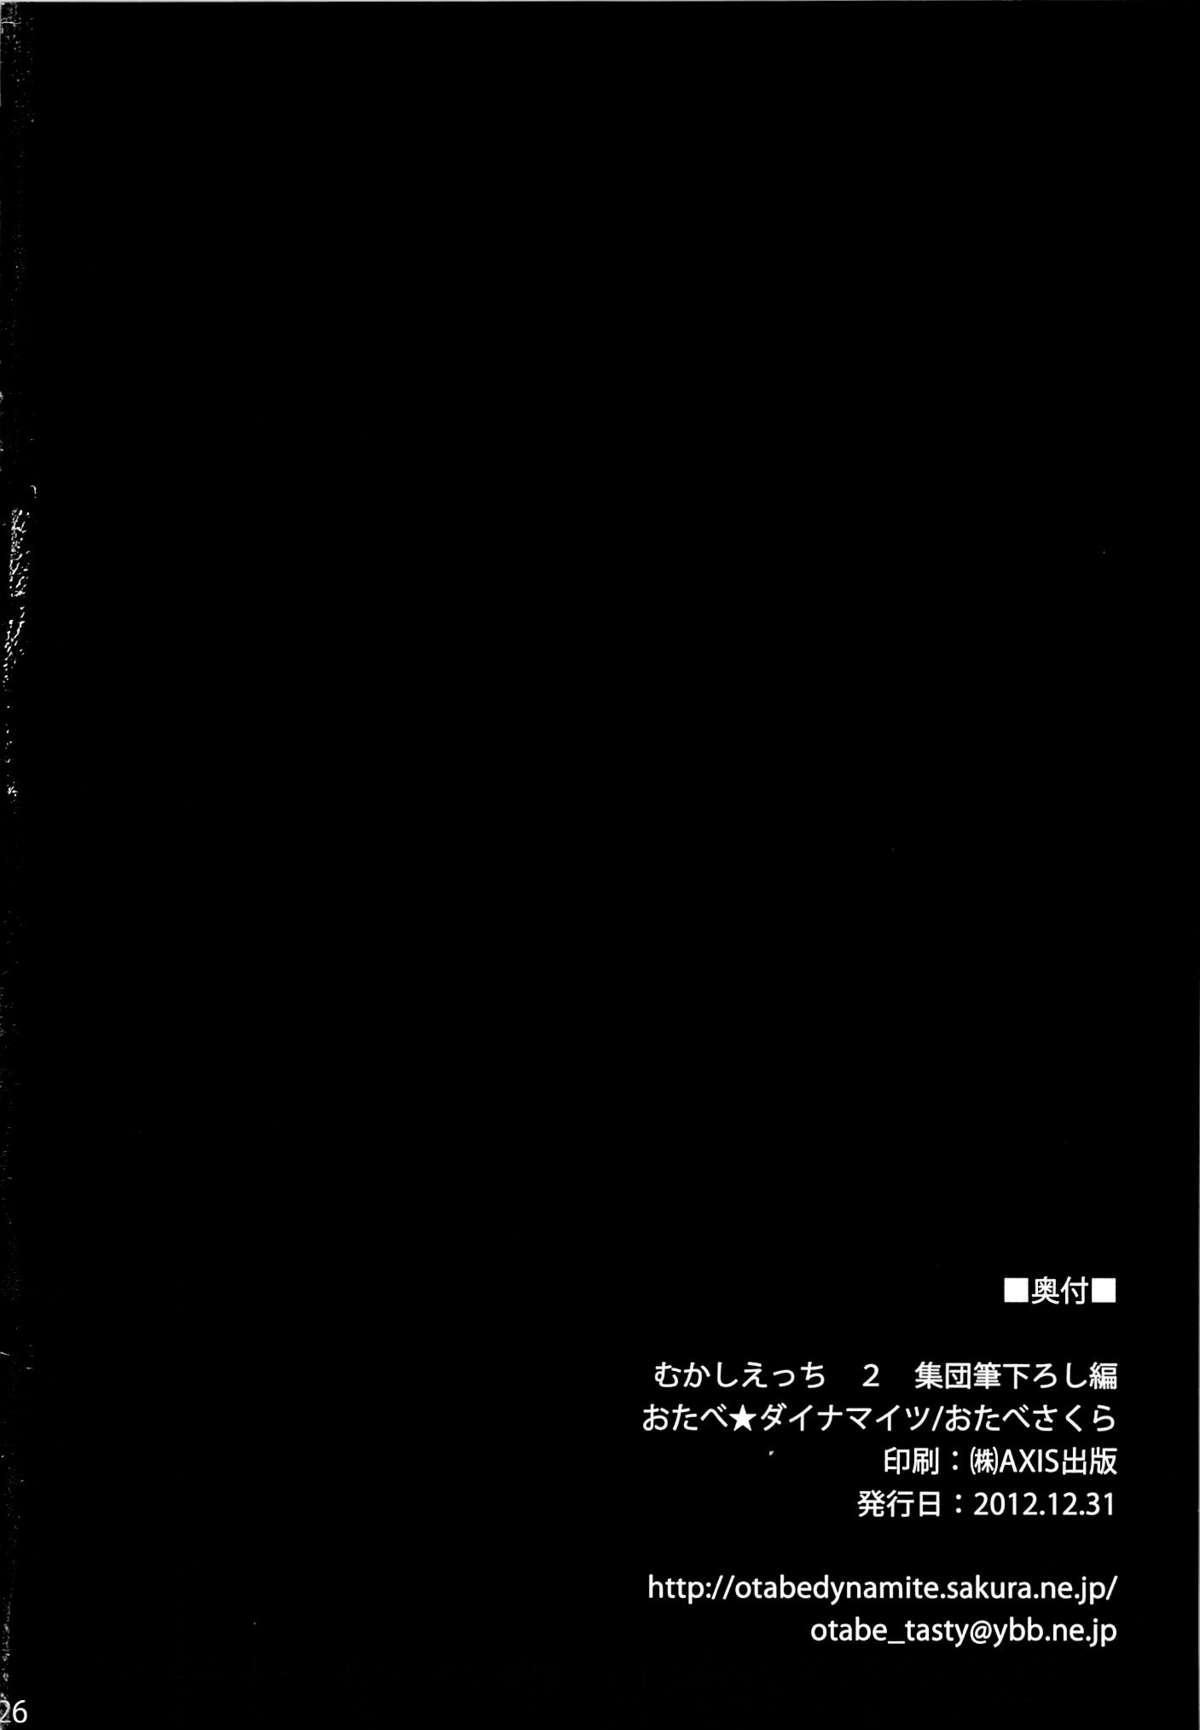 Mukashi Ecchi 2 Shuudan Fudeoroshi hen 22